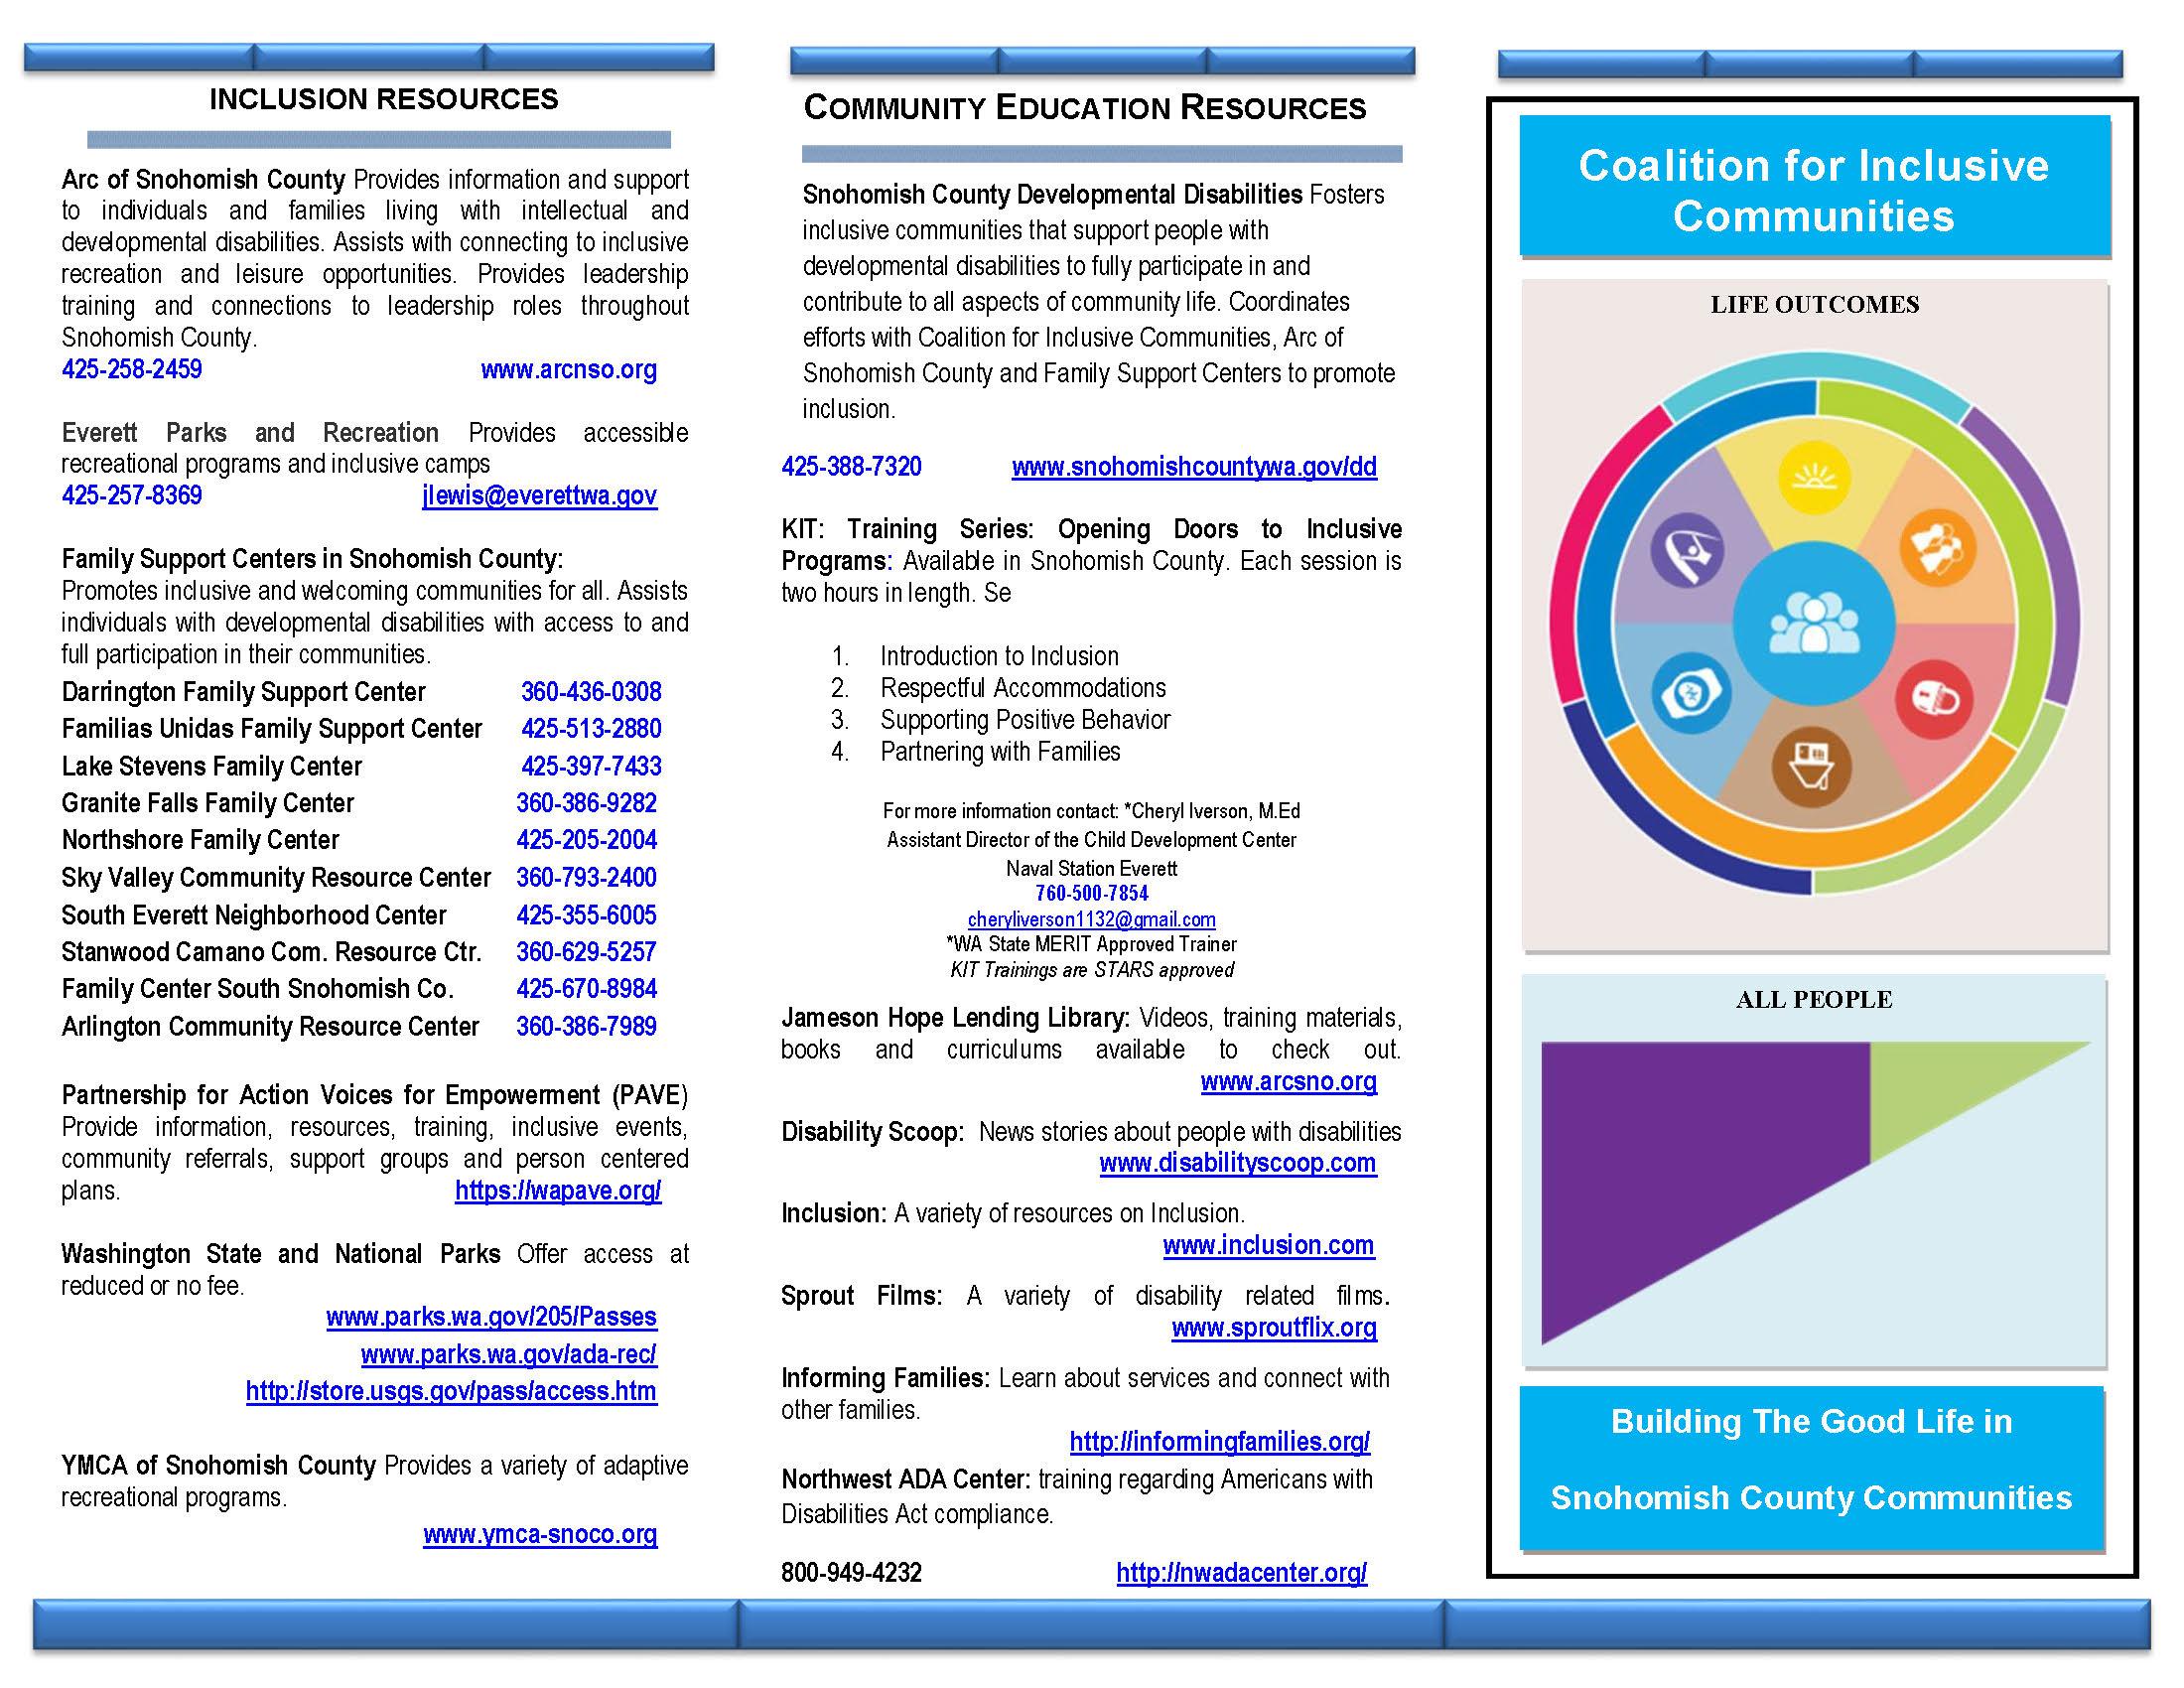 Coalition for Inclusive Communities Brochure